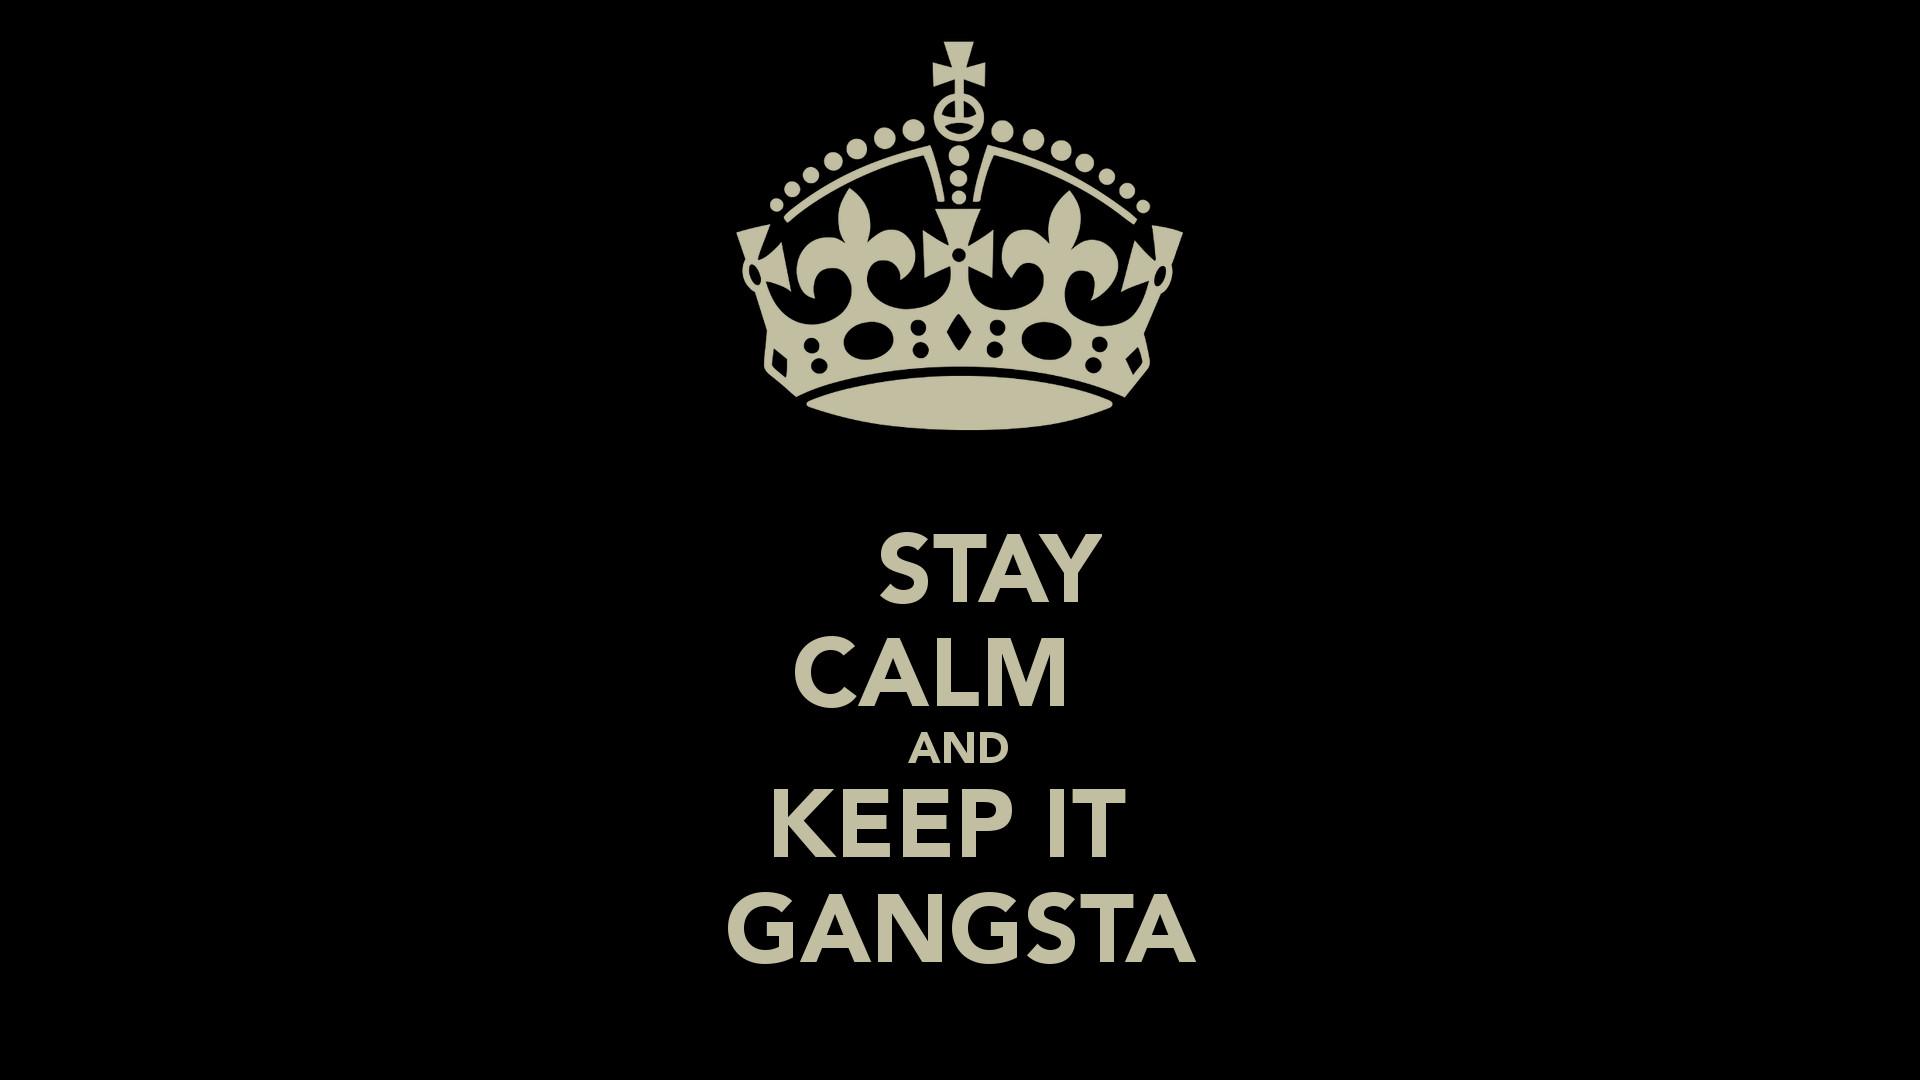 Gangster Wallpapers Wallpaper   Wallpapers 4k   Pinterest   Gangsters,  Wallpaper and 3d